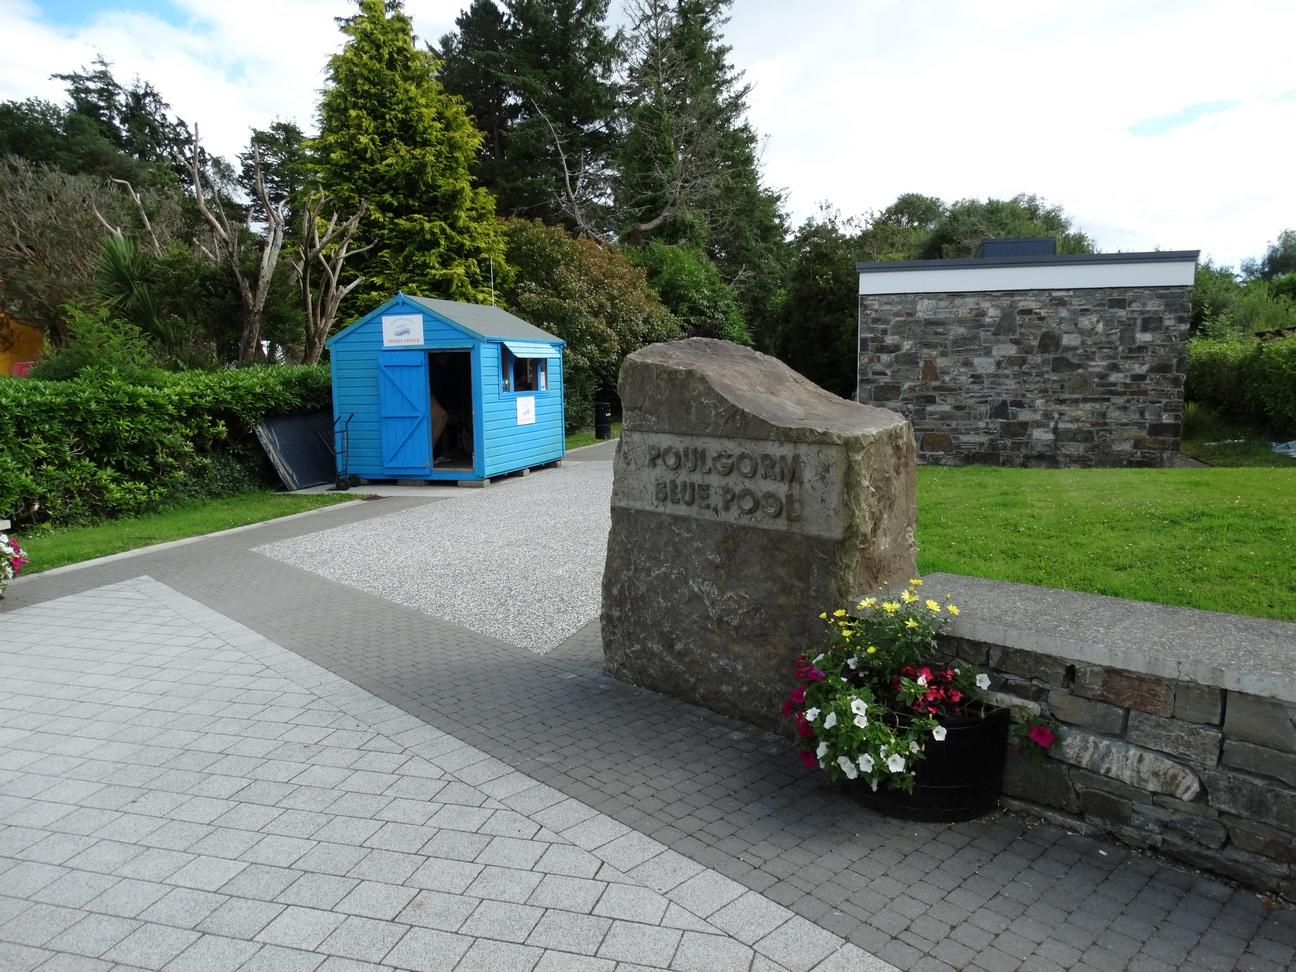 Blue Pool Park & Ferry Service